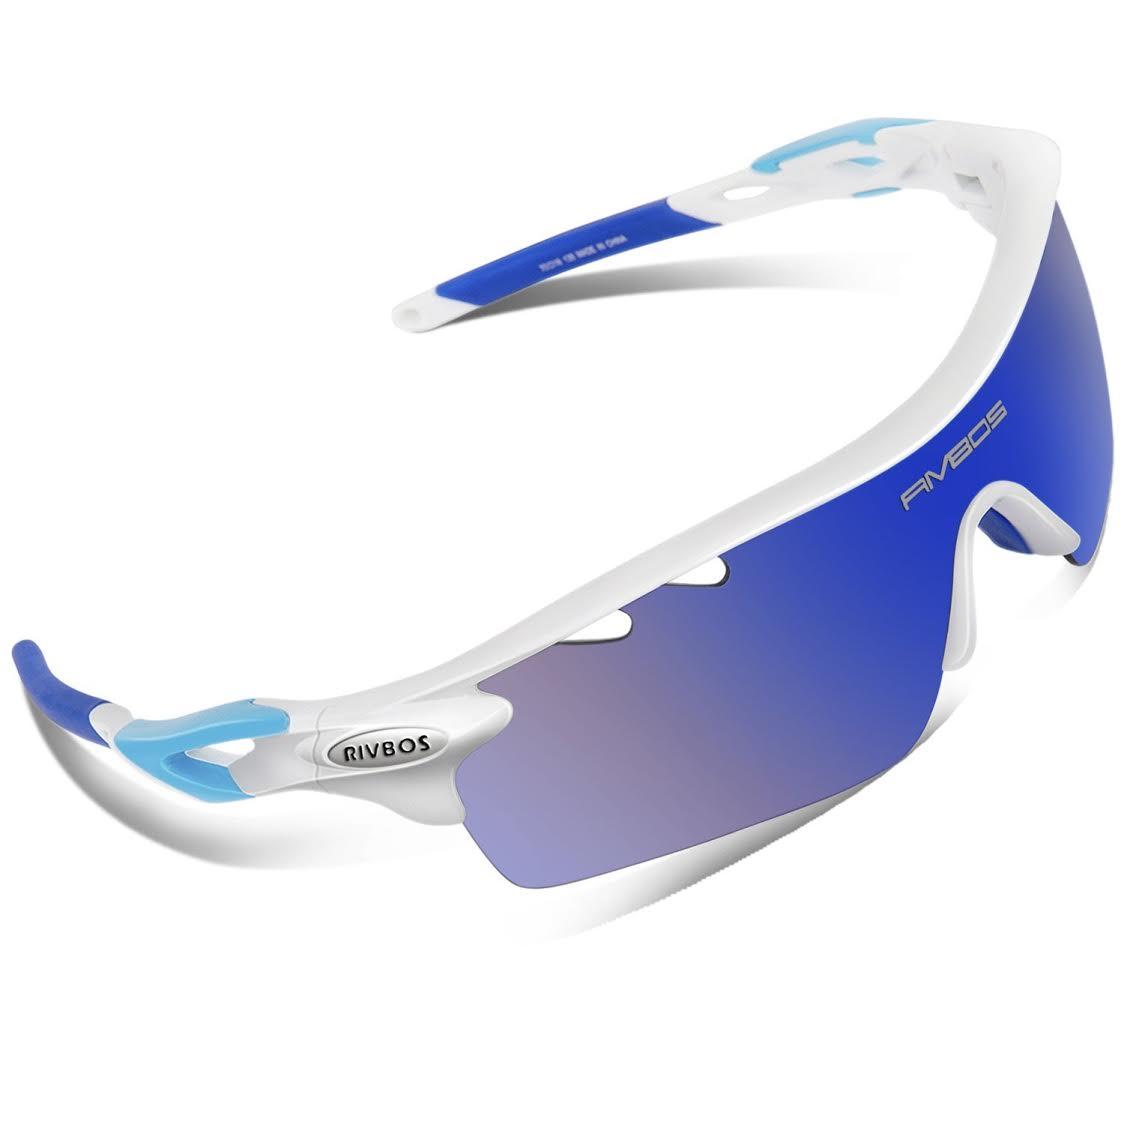 Polarized Sports Sunglasses 5 Interchangeable Lenses $9.99 FSSS Amazon